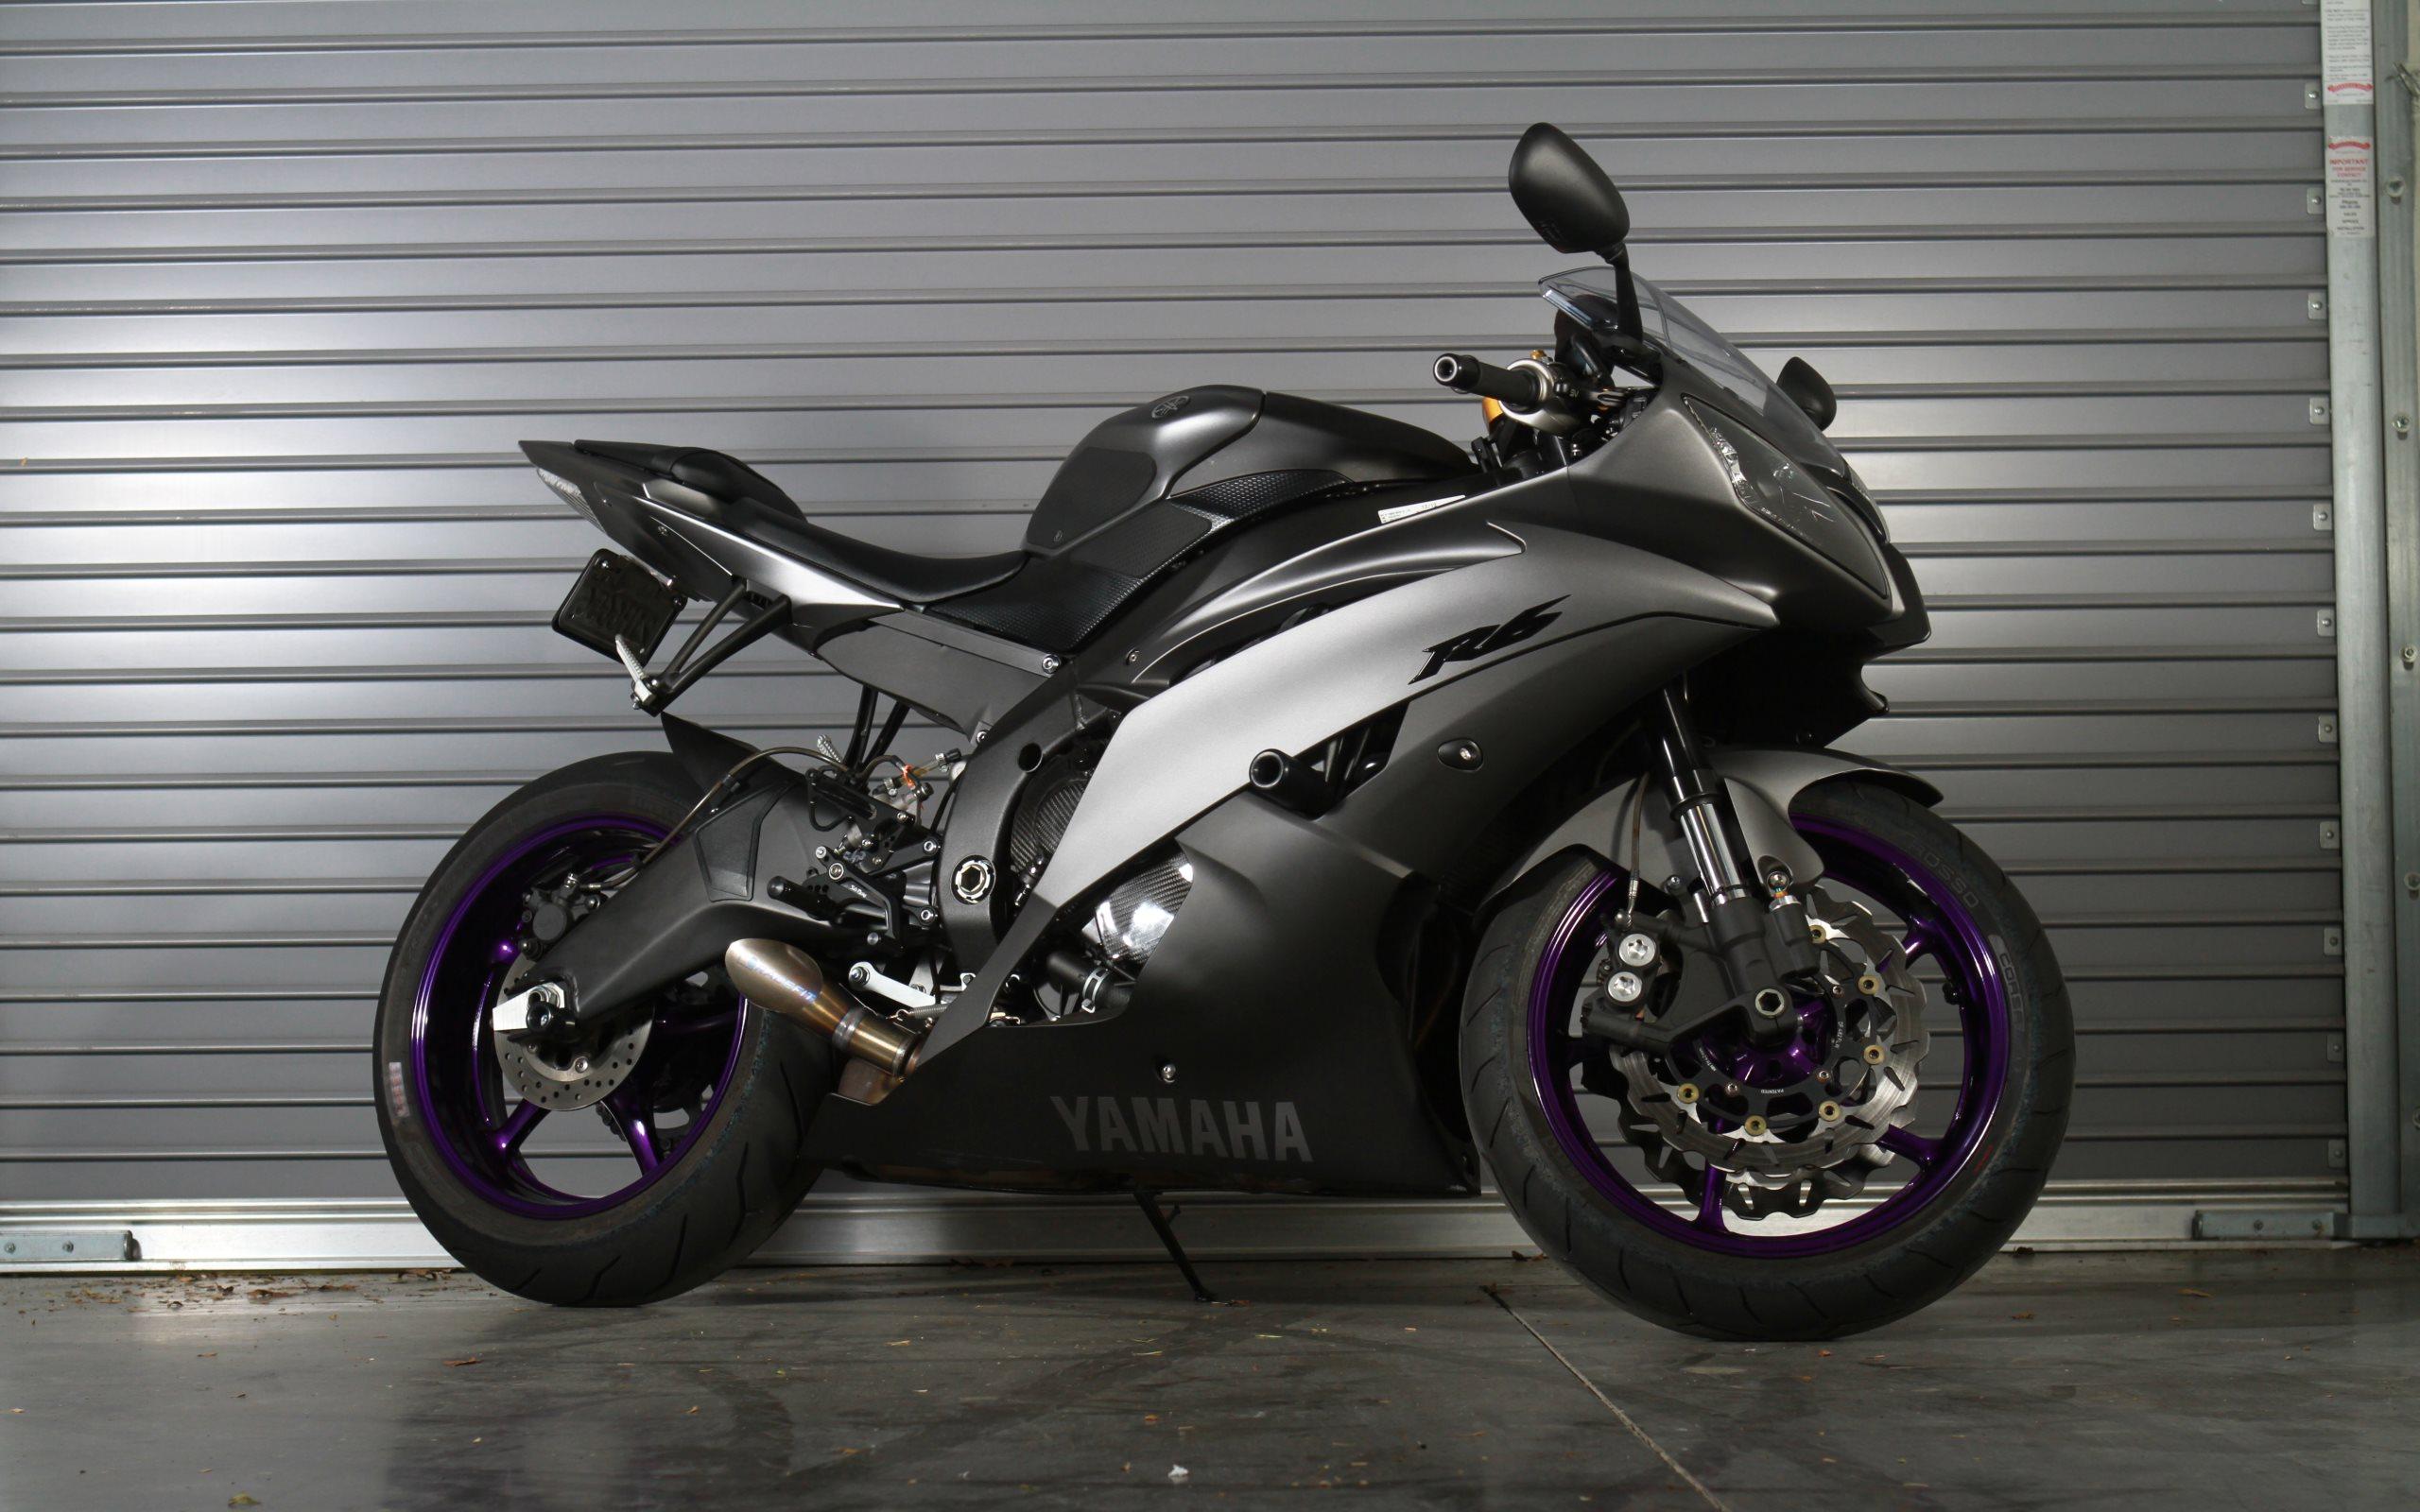 2009 Yamaha YZF-R6 Comparison - Motorcycle USA